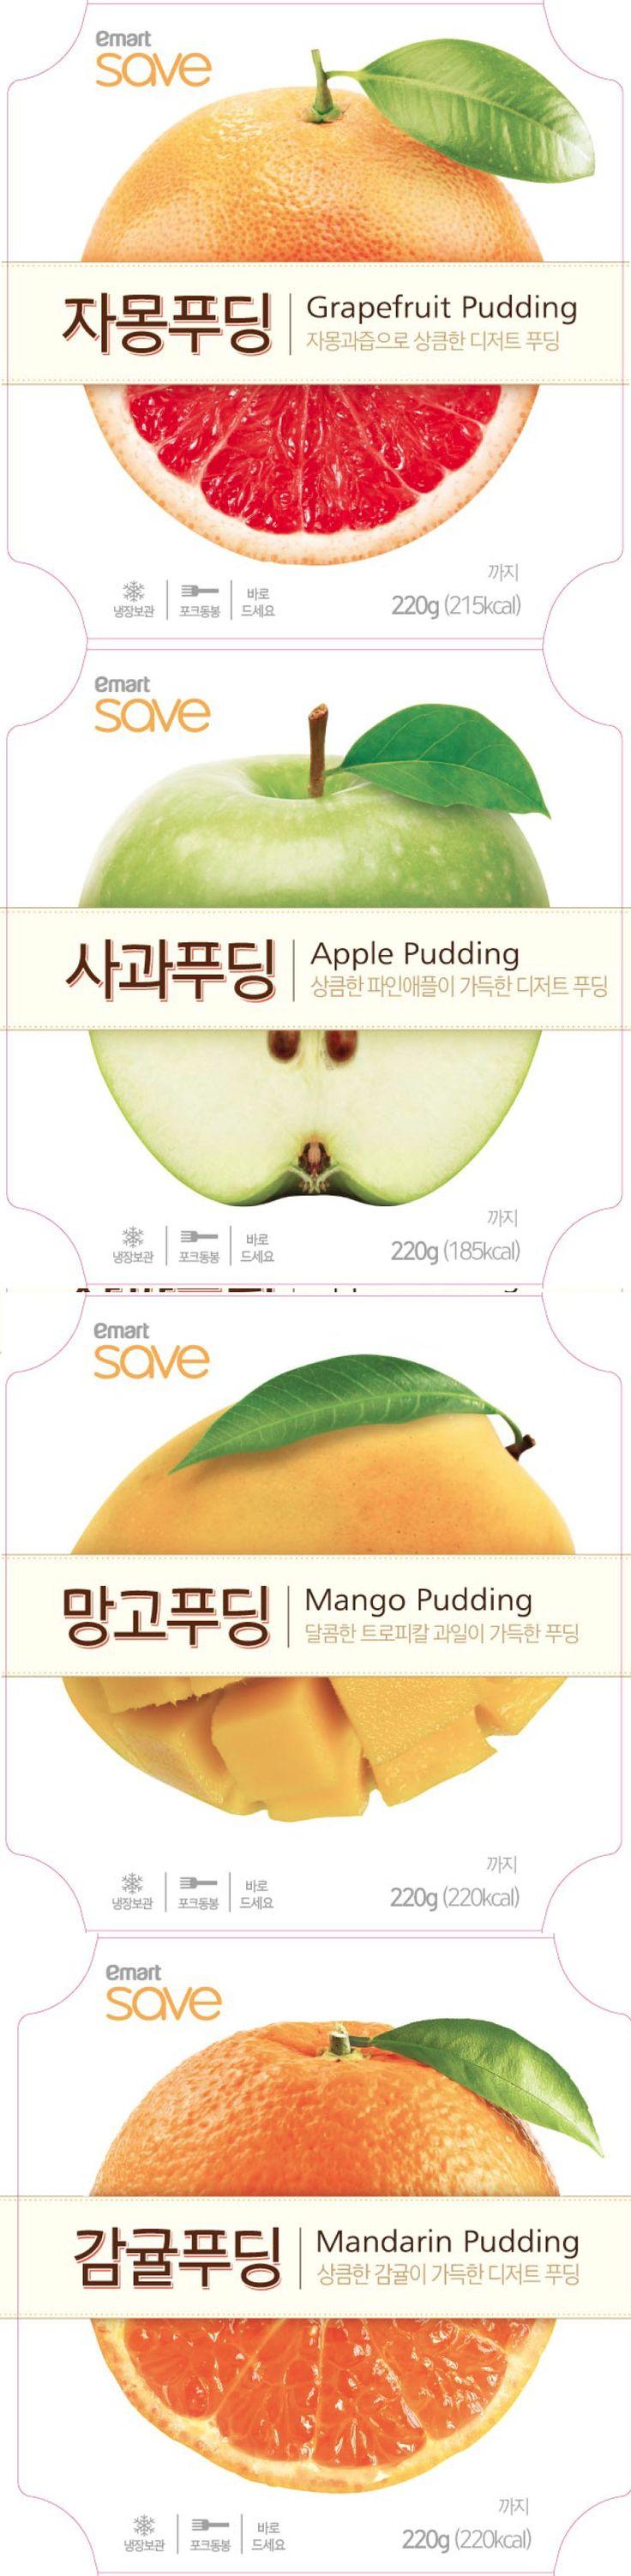 pudding series